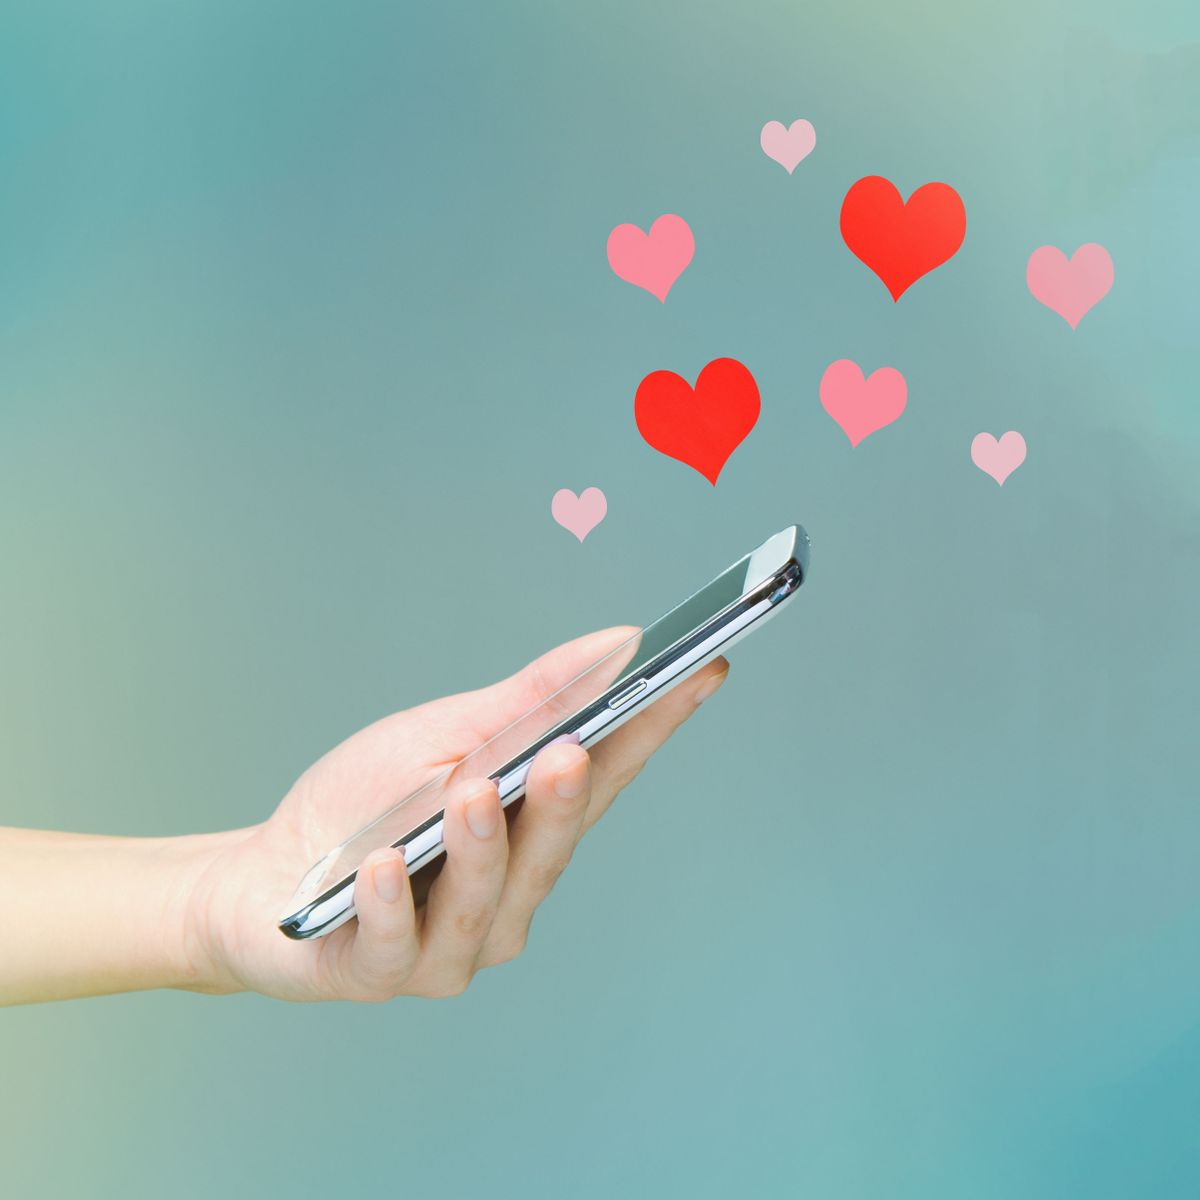 shaadi  dating website